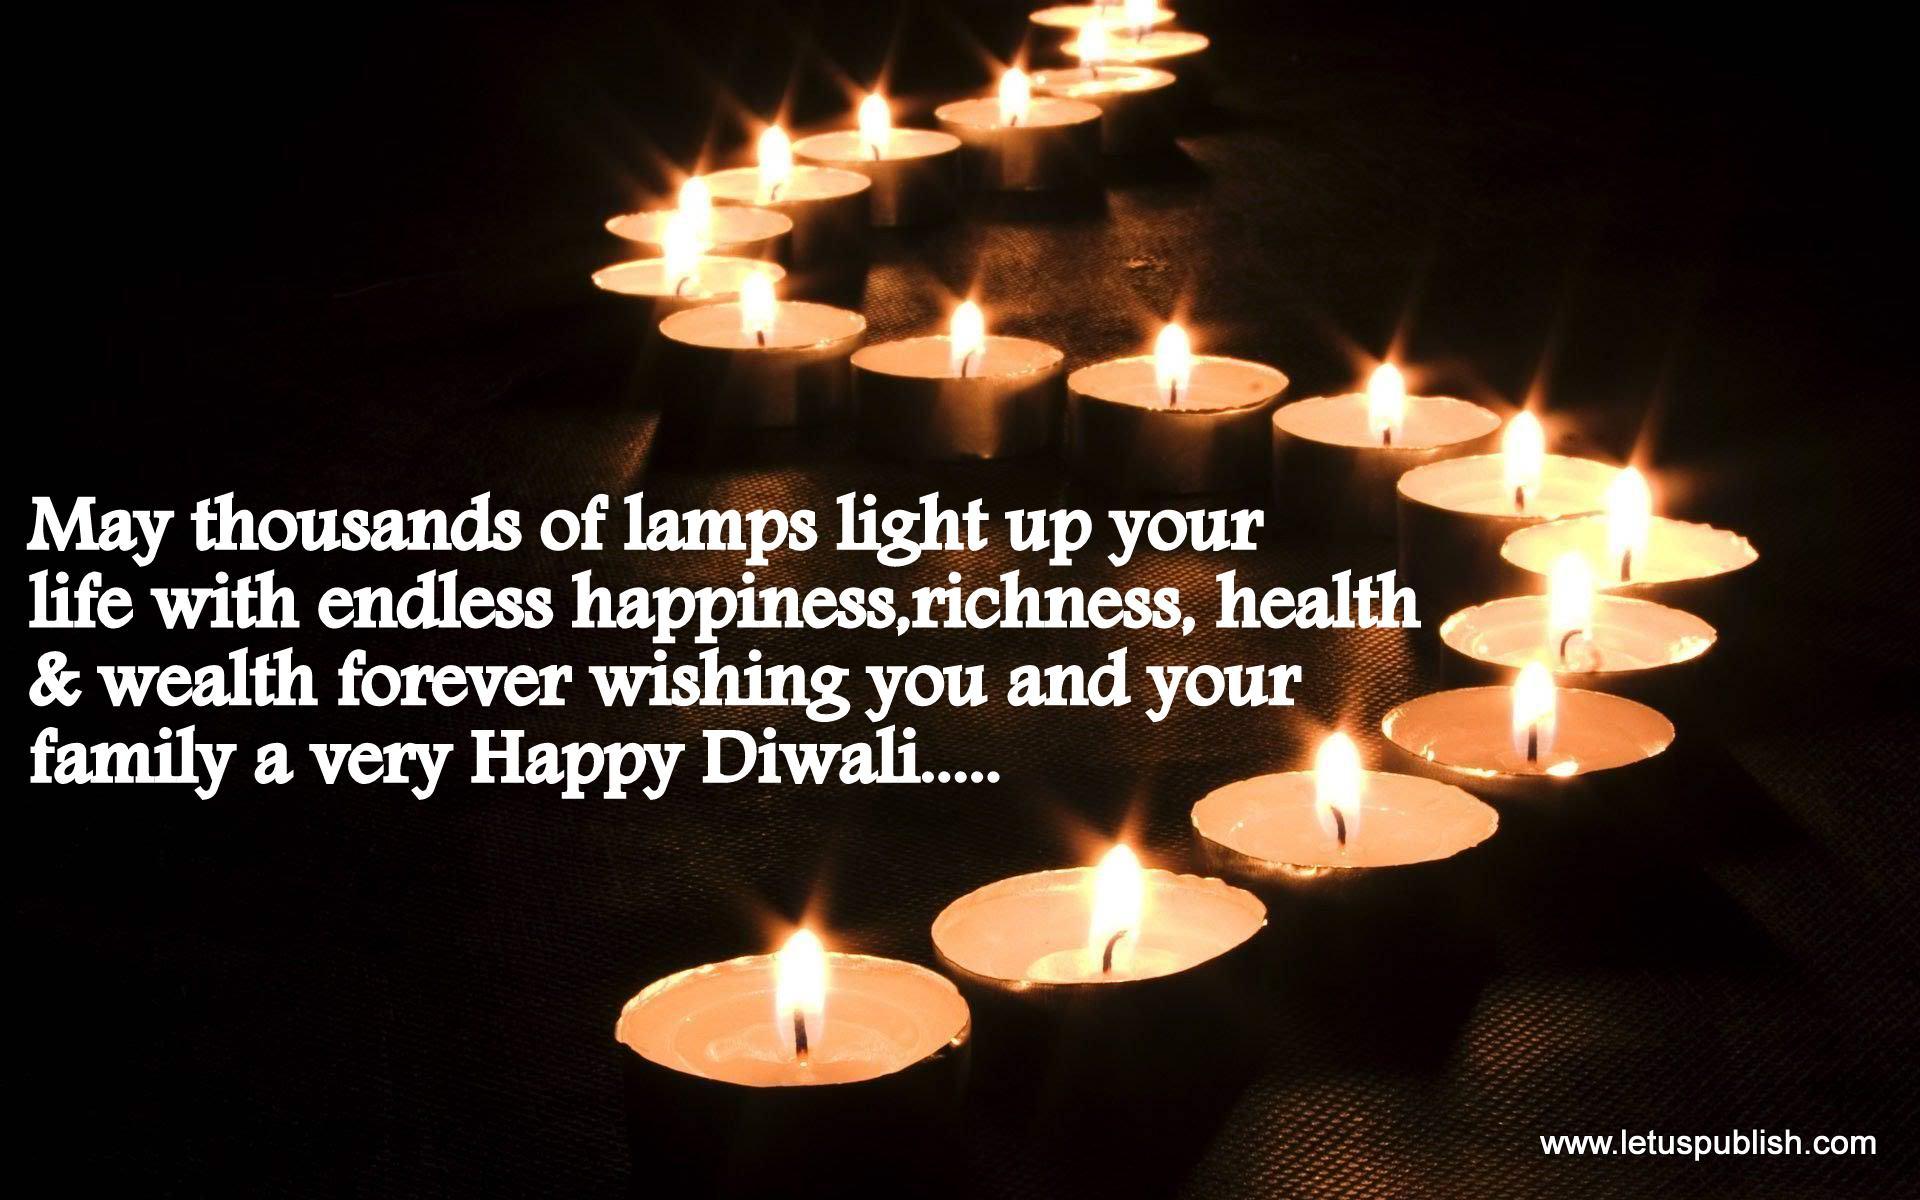 Happy Diwali wallpaper download or mobile